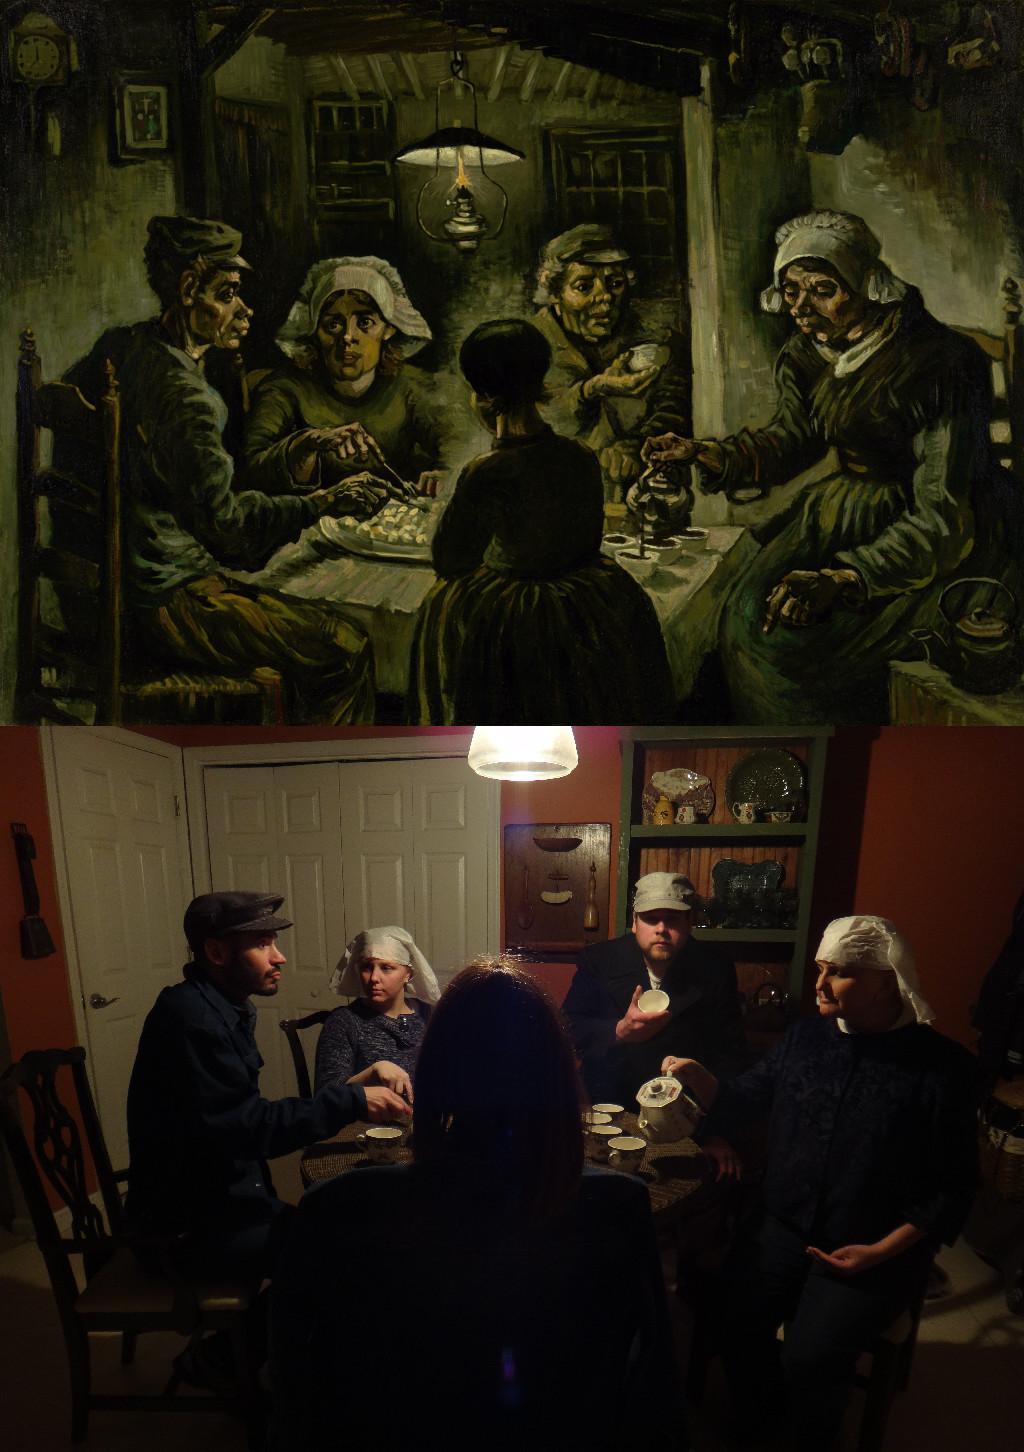 The Potato Eaters, Vincent van Gogh (1853-1890) vanGo'd by carl jordan